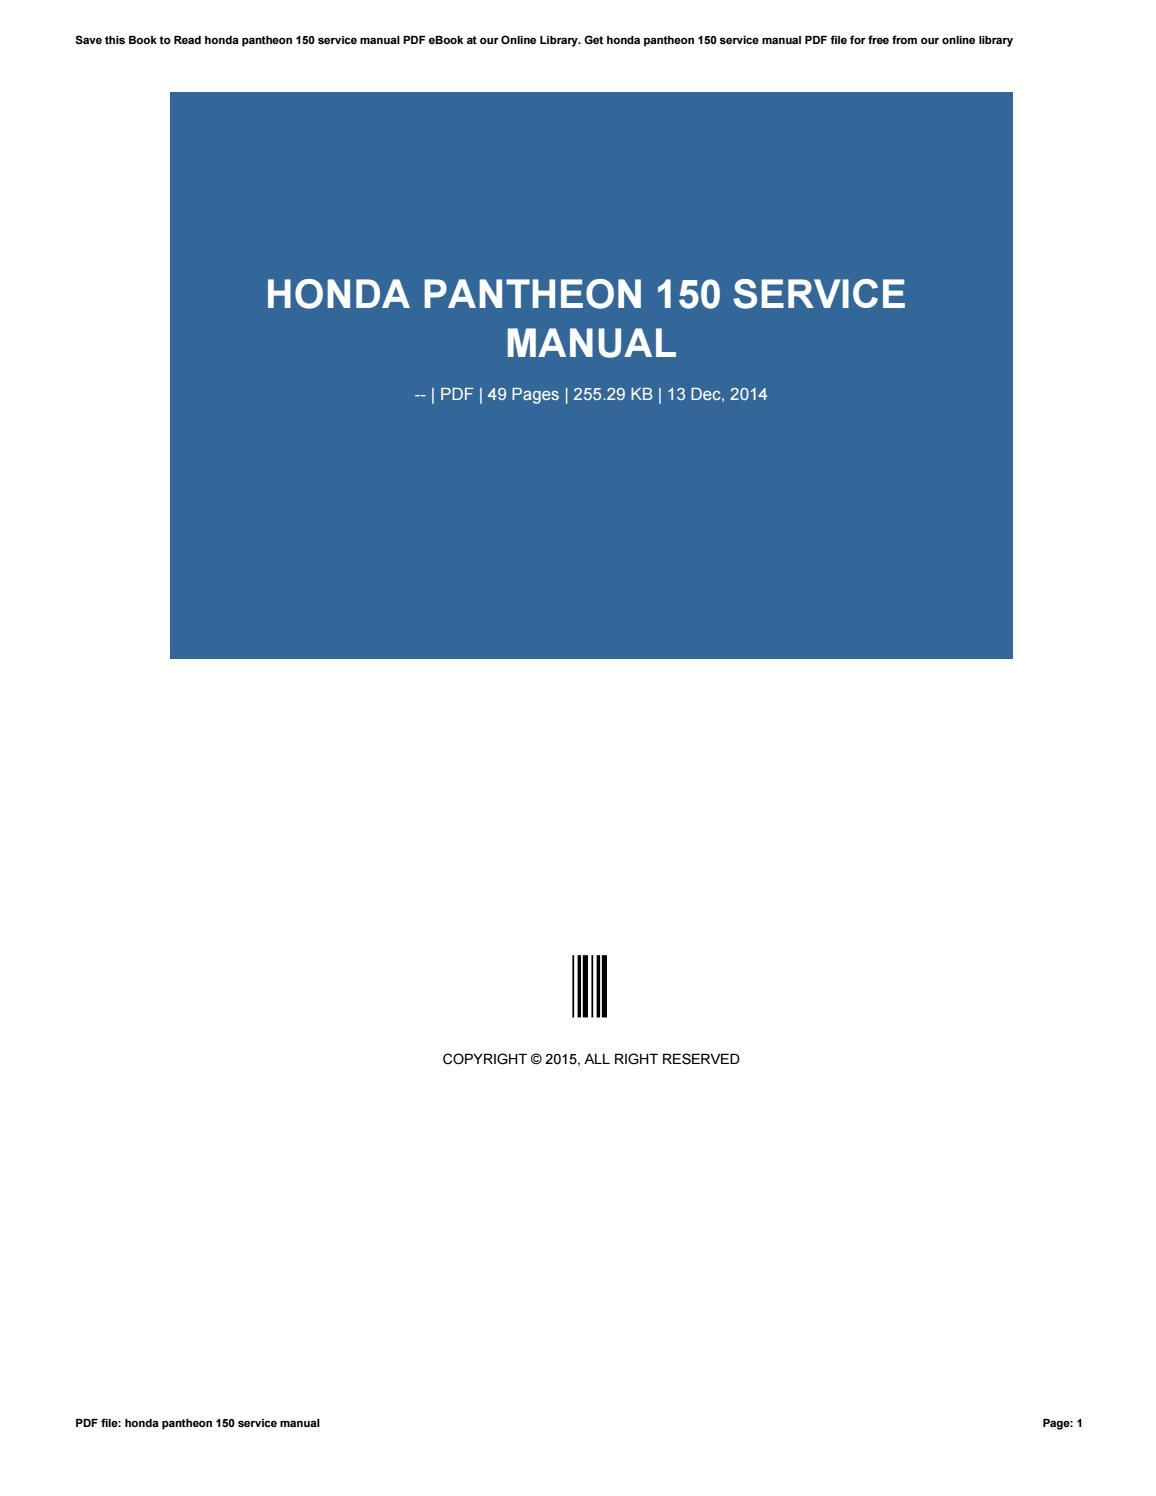 Rci 2980 manual ebook array iwcf manuals ebook rh iwcf manuals ebook beritaloka us fandeluxe Images